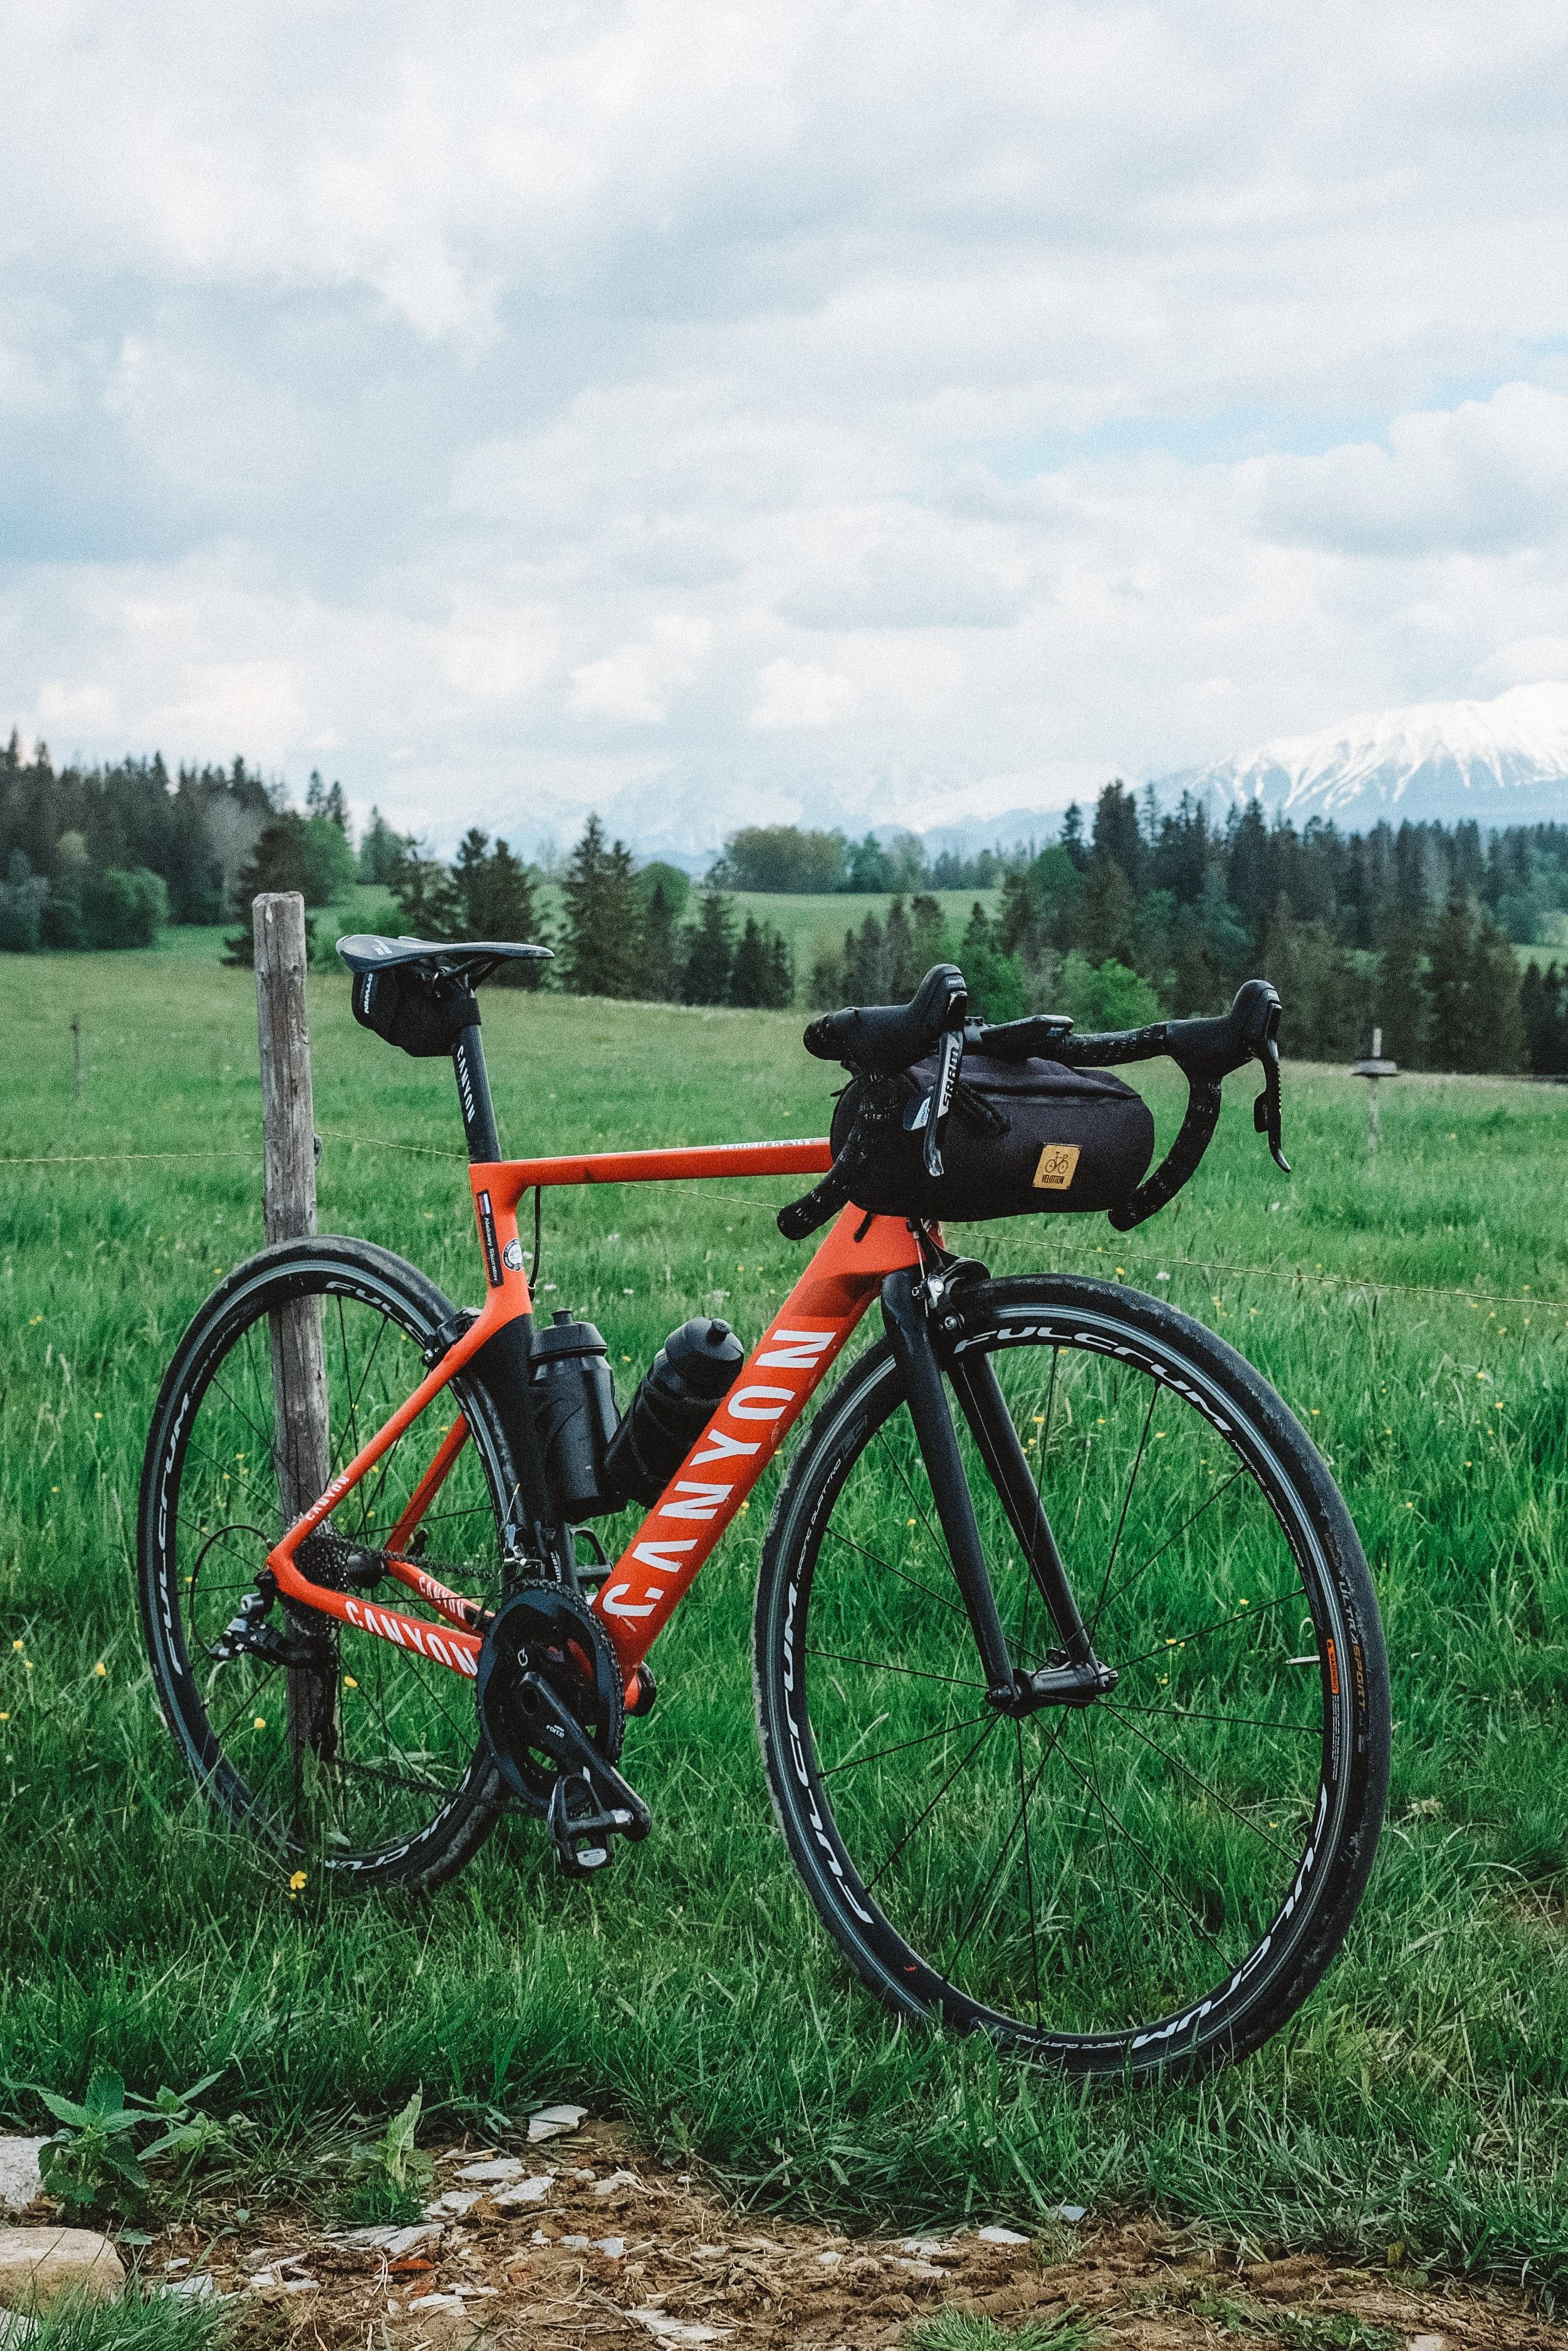 Cayolle Handlebar Bag Navy Blue In 2020 Handlebar Bag Bicycle Bag Bike Handlebars